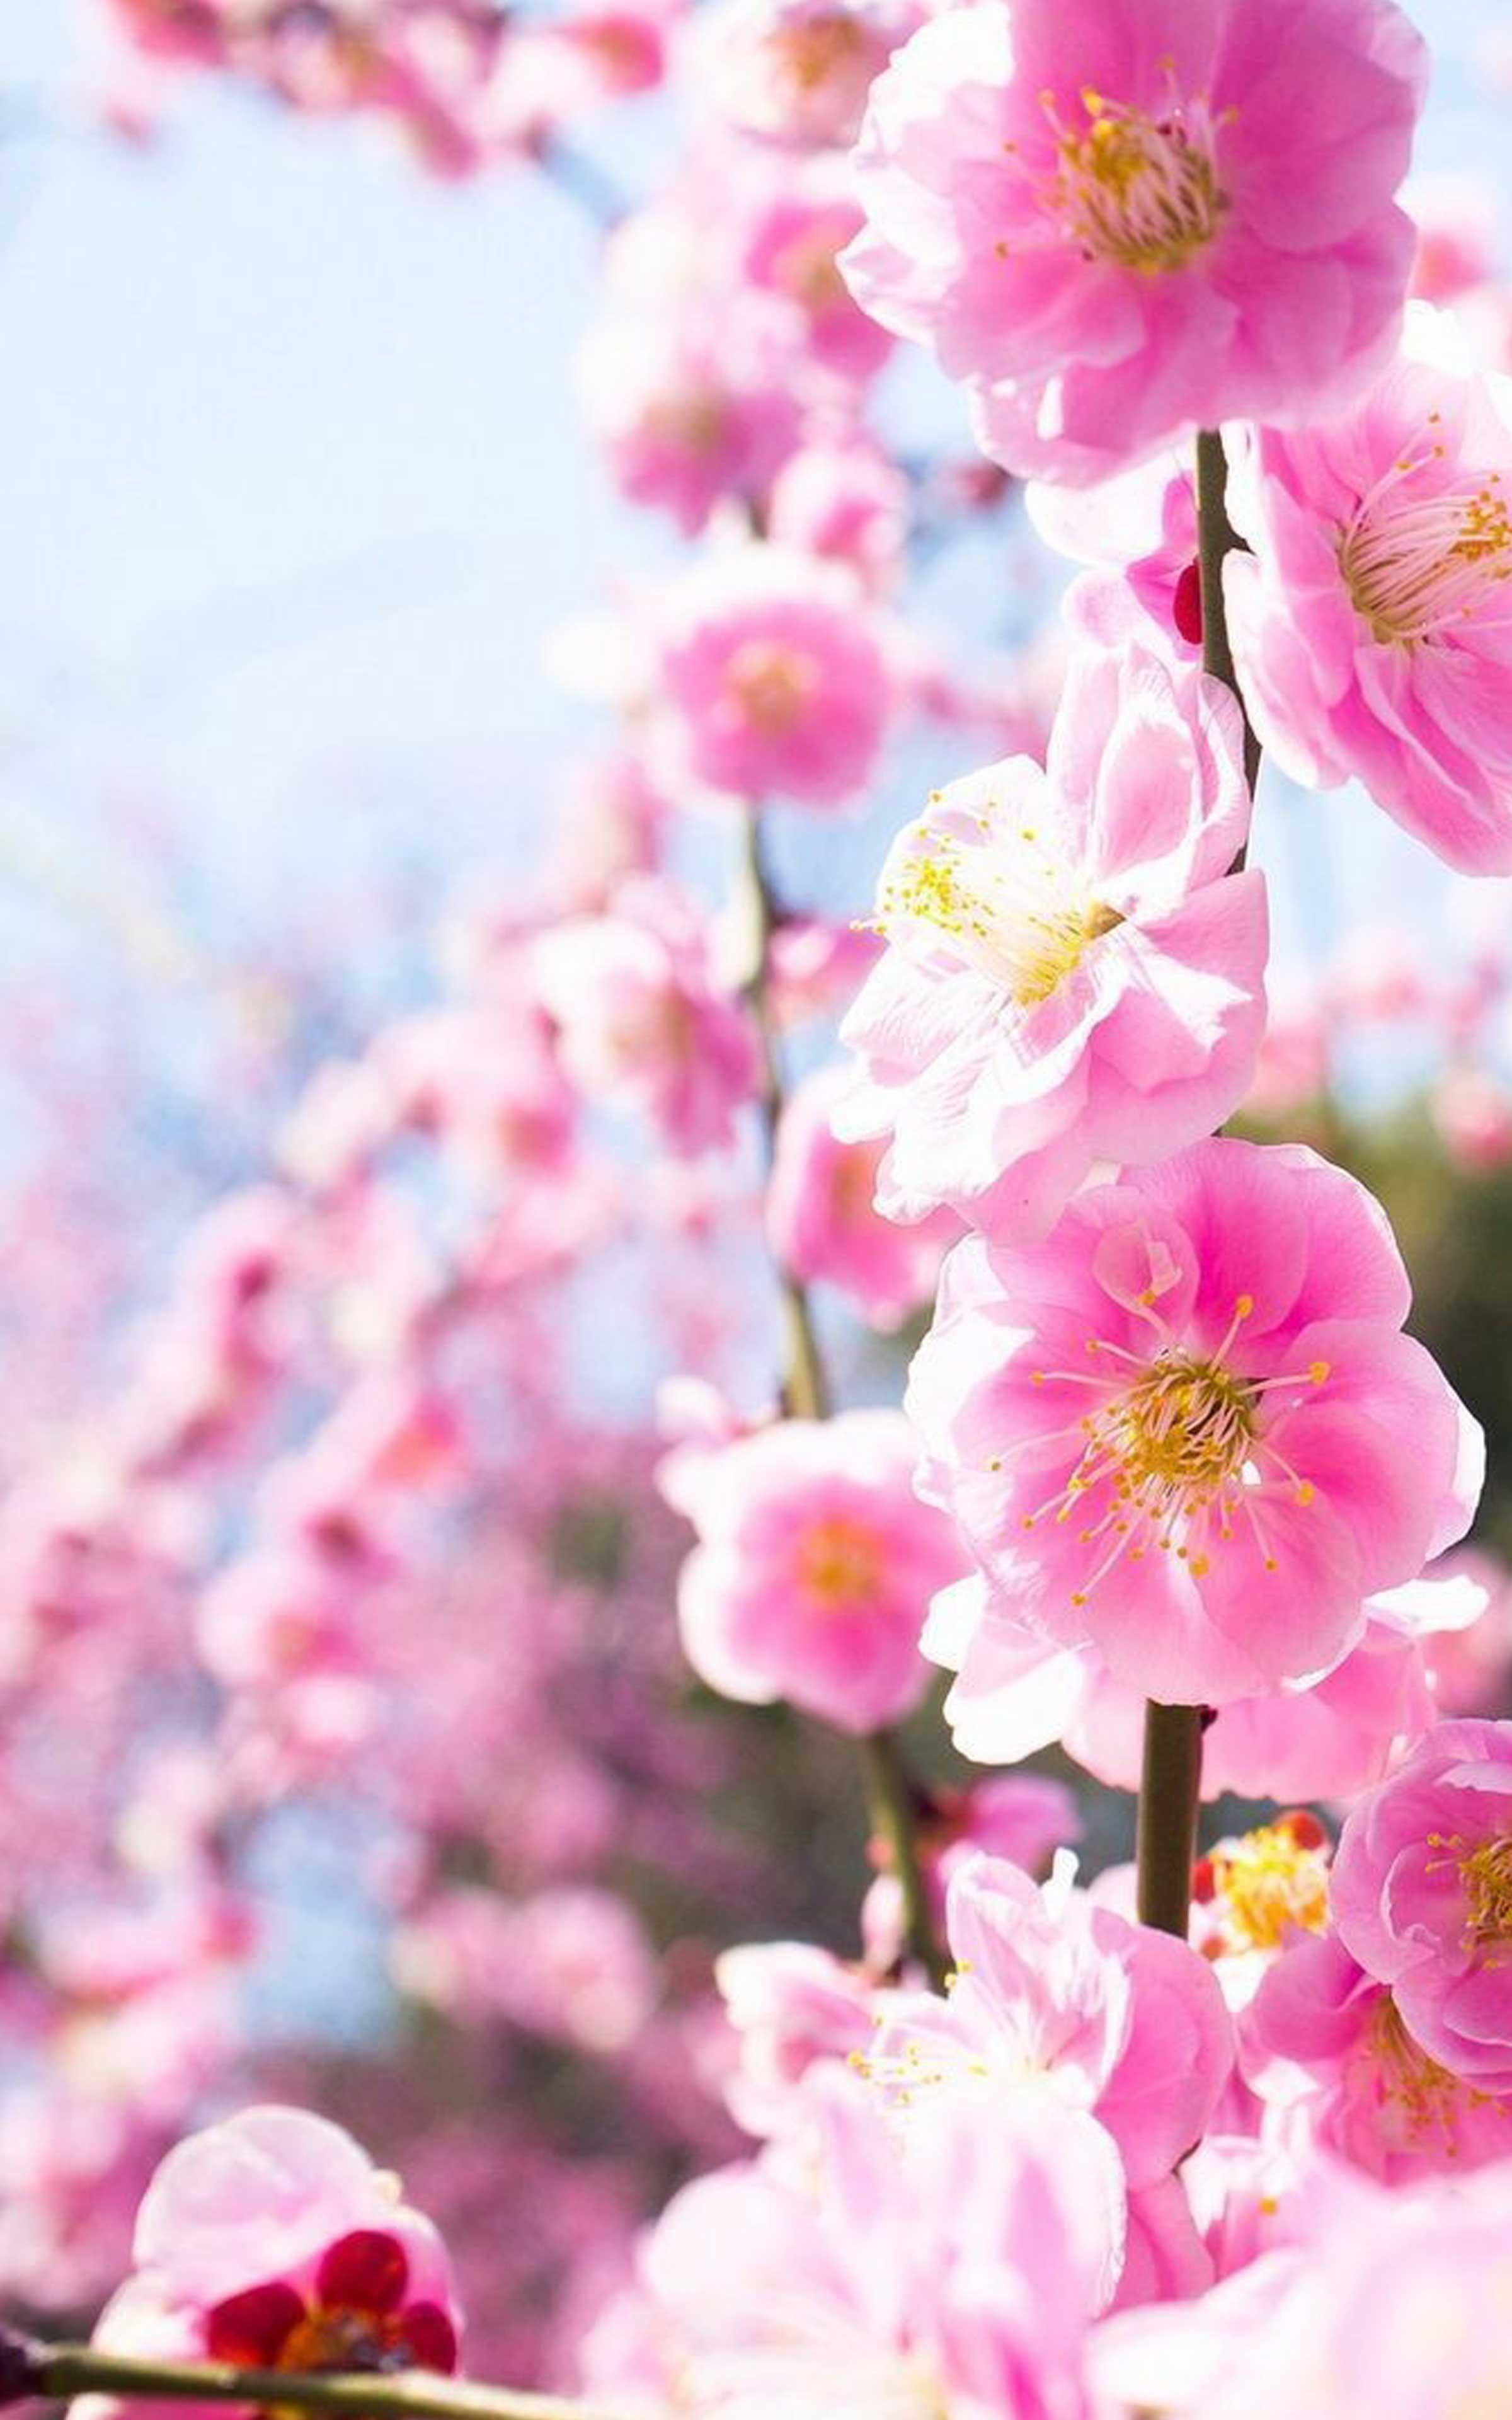 Pink Flower Wallpaper HD - Pink Flower Wallpapers for ...